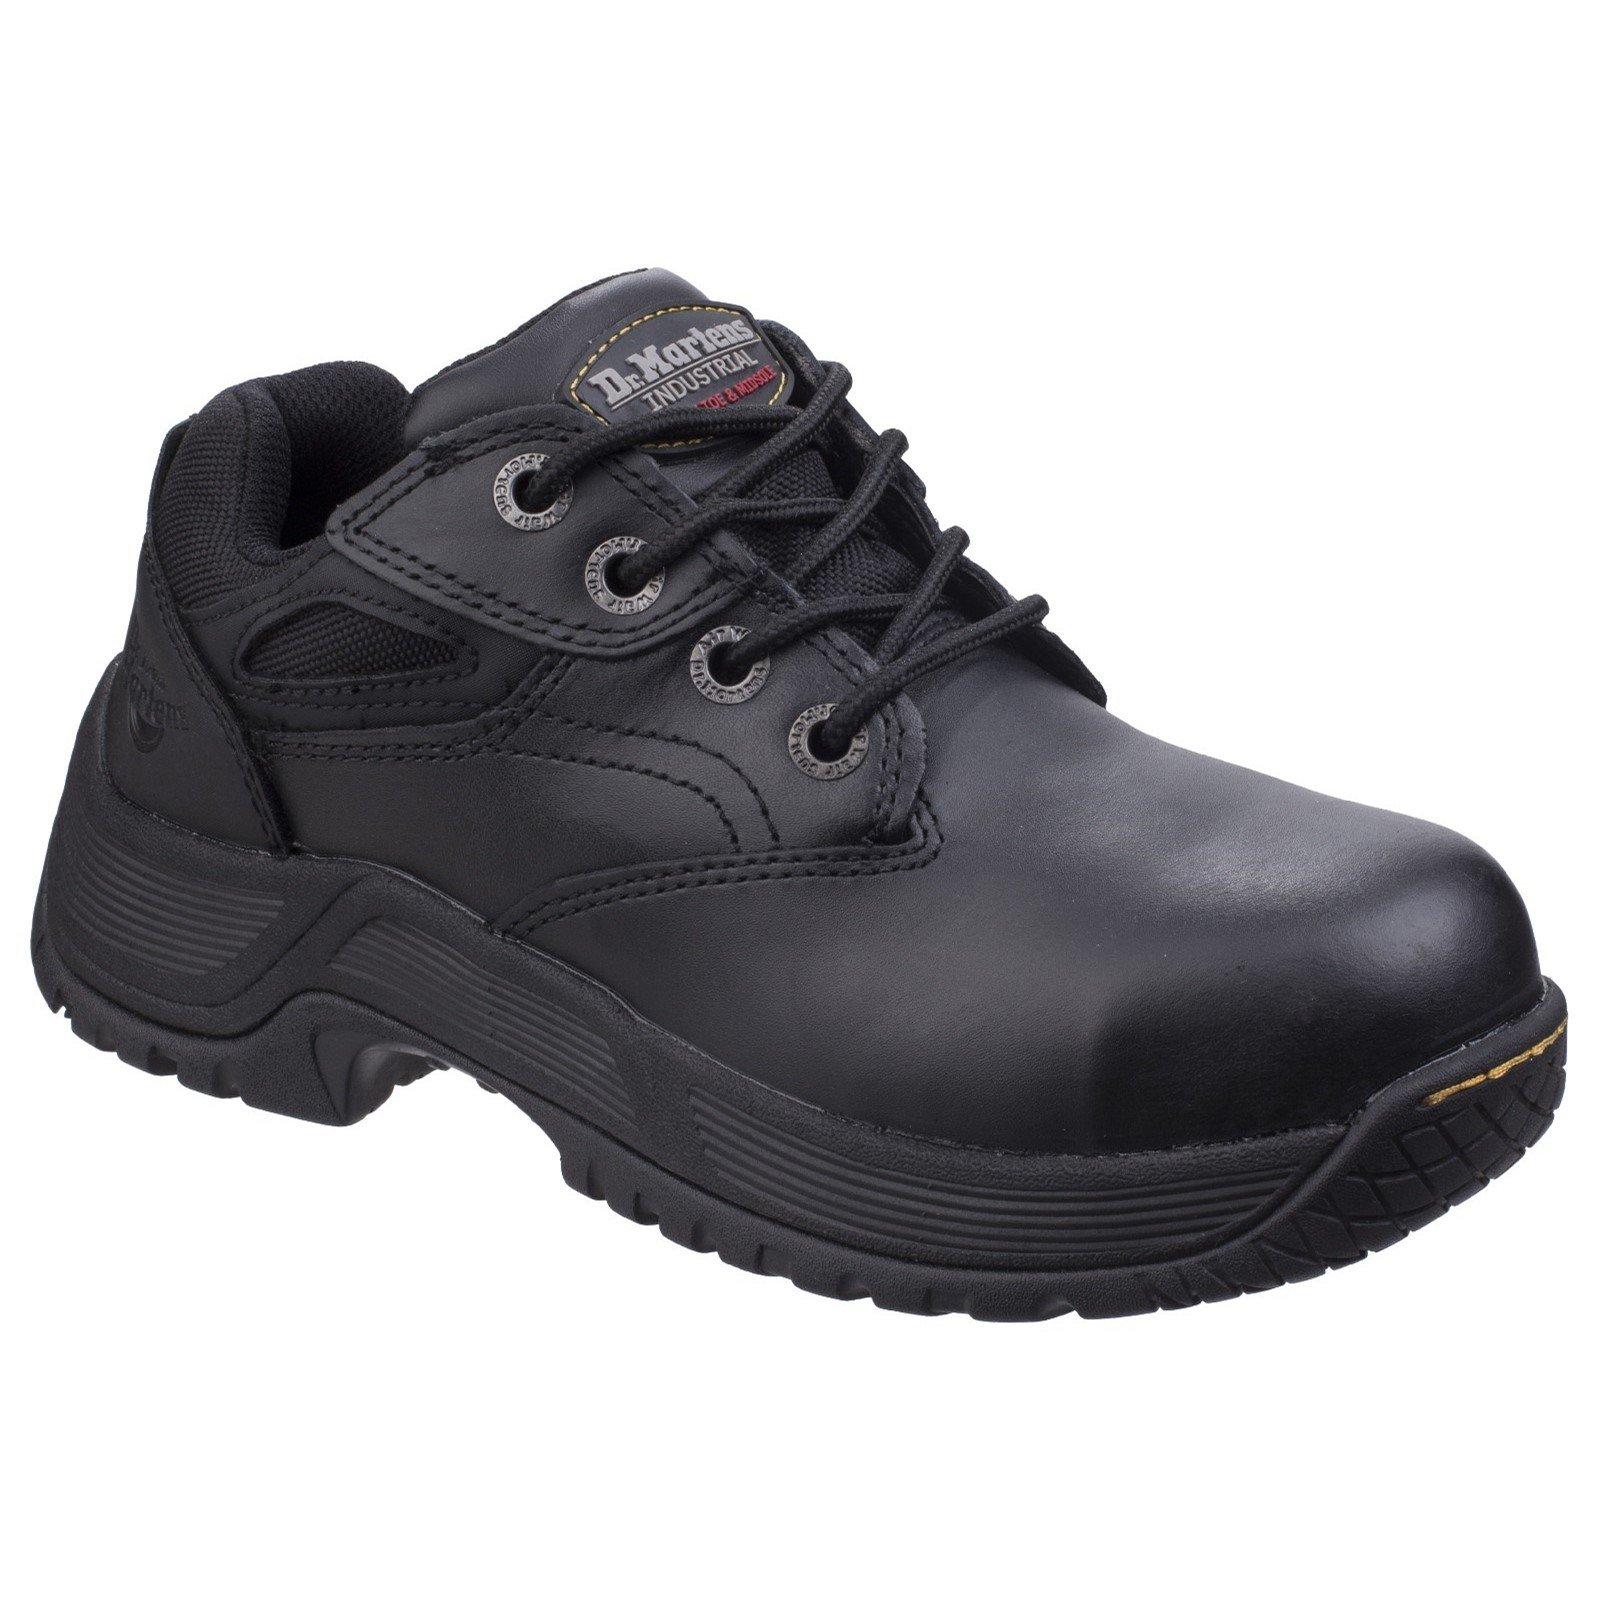 Dr Martens Unisex Calvert Steel Toe Safety Trainer Black 26022 - Black 10